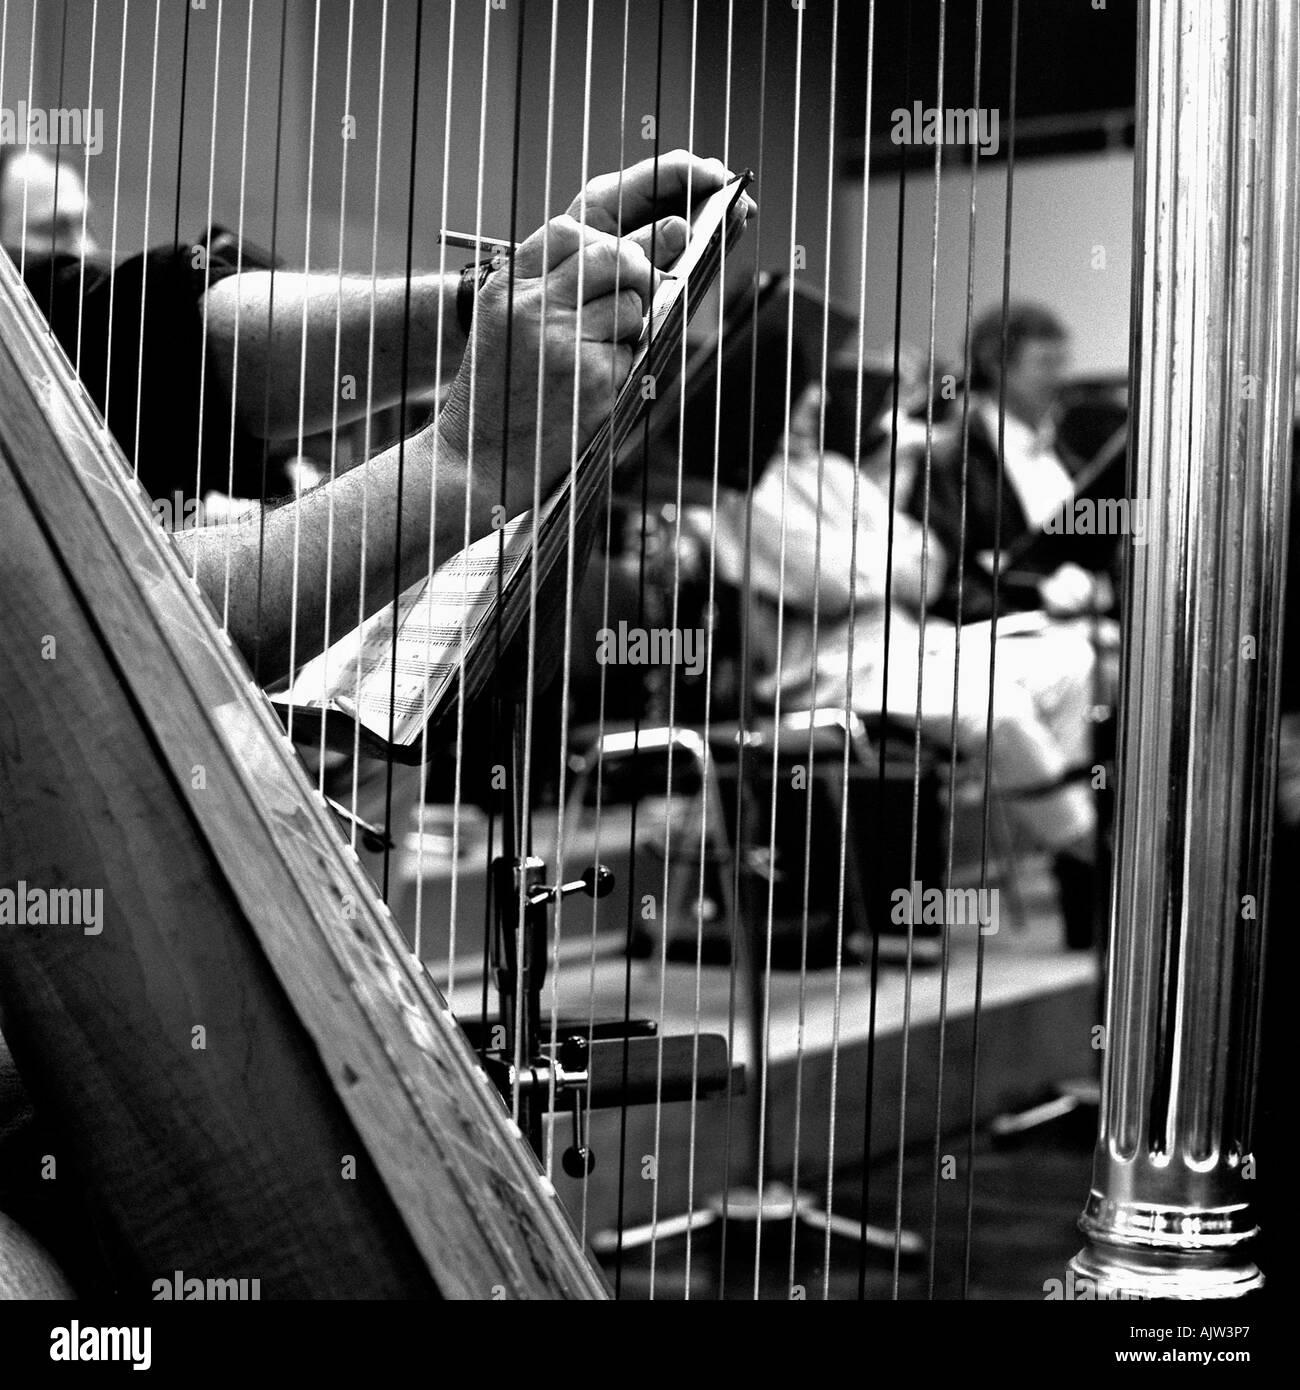 Hand Harp Stock Photos & Hand Harp Stock Images - Alamy